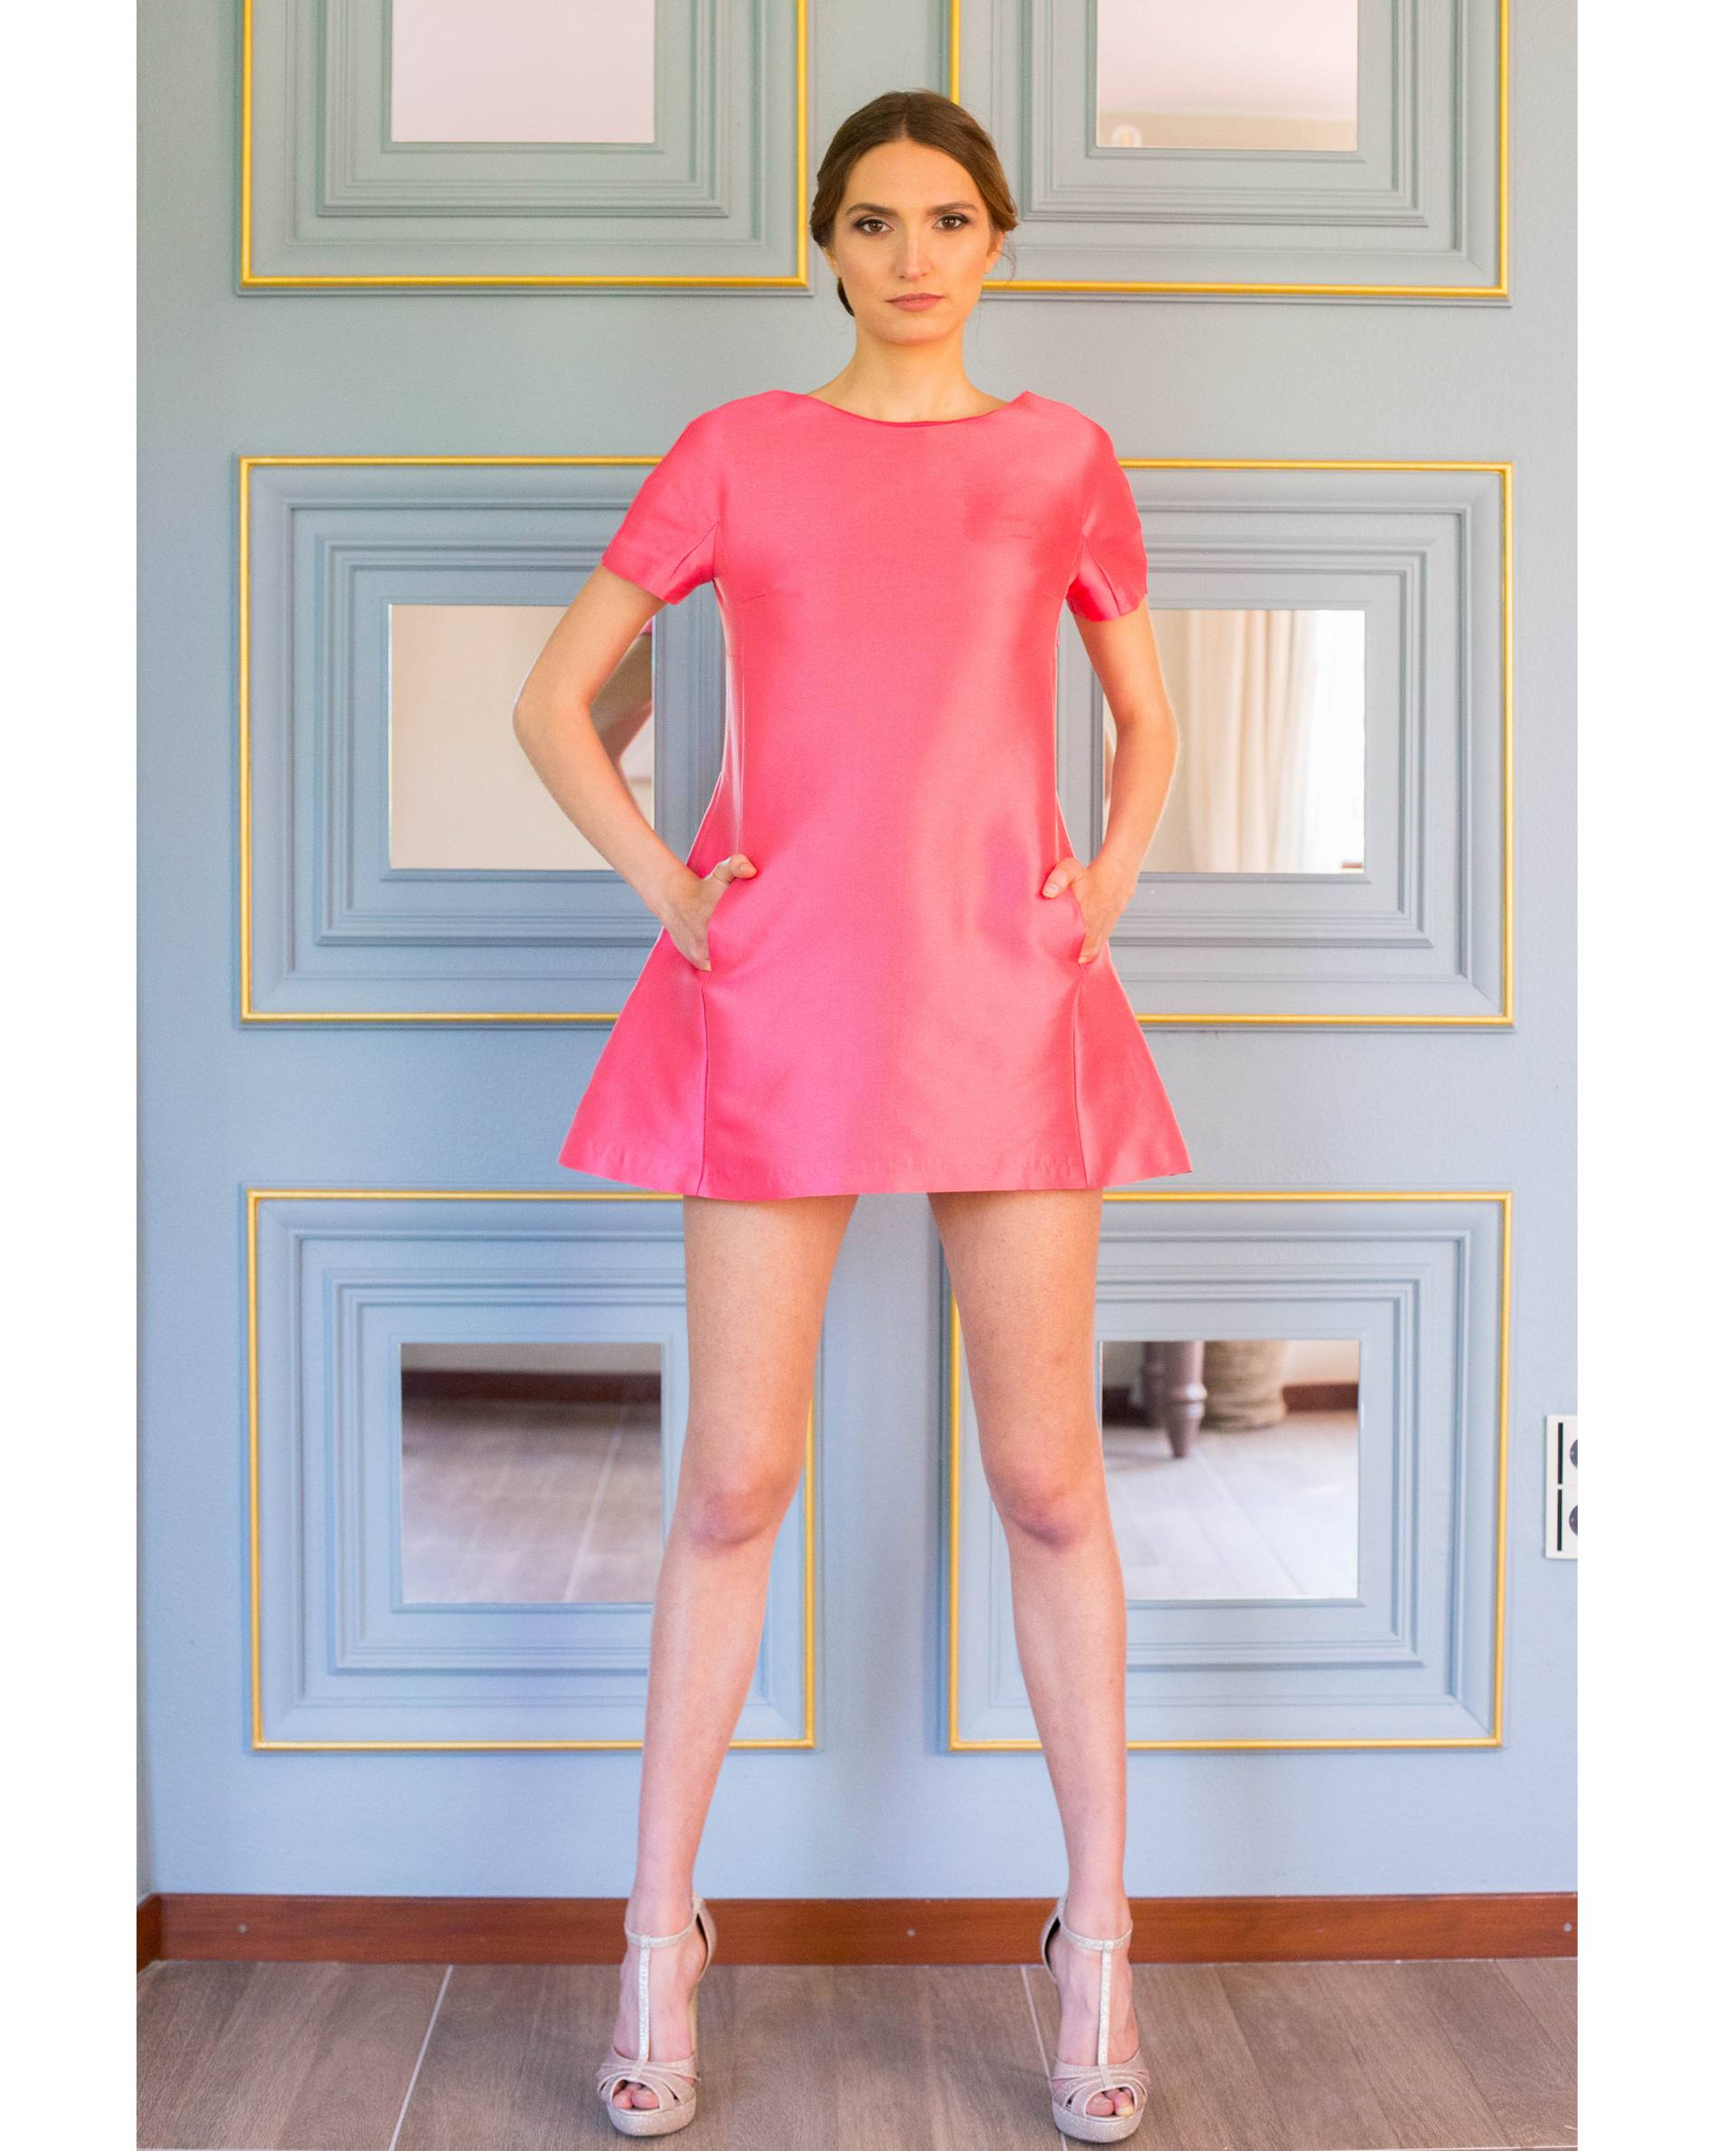 ATELIER-NATURE 2018/19 - VESTIDOS - vestido fiesta MARTINA rosa